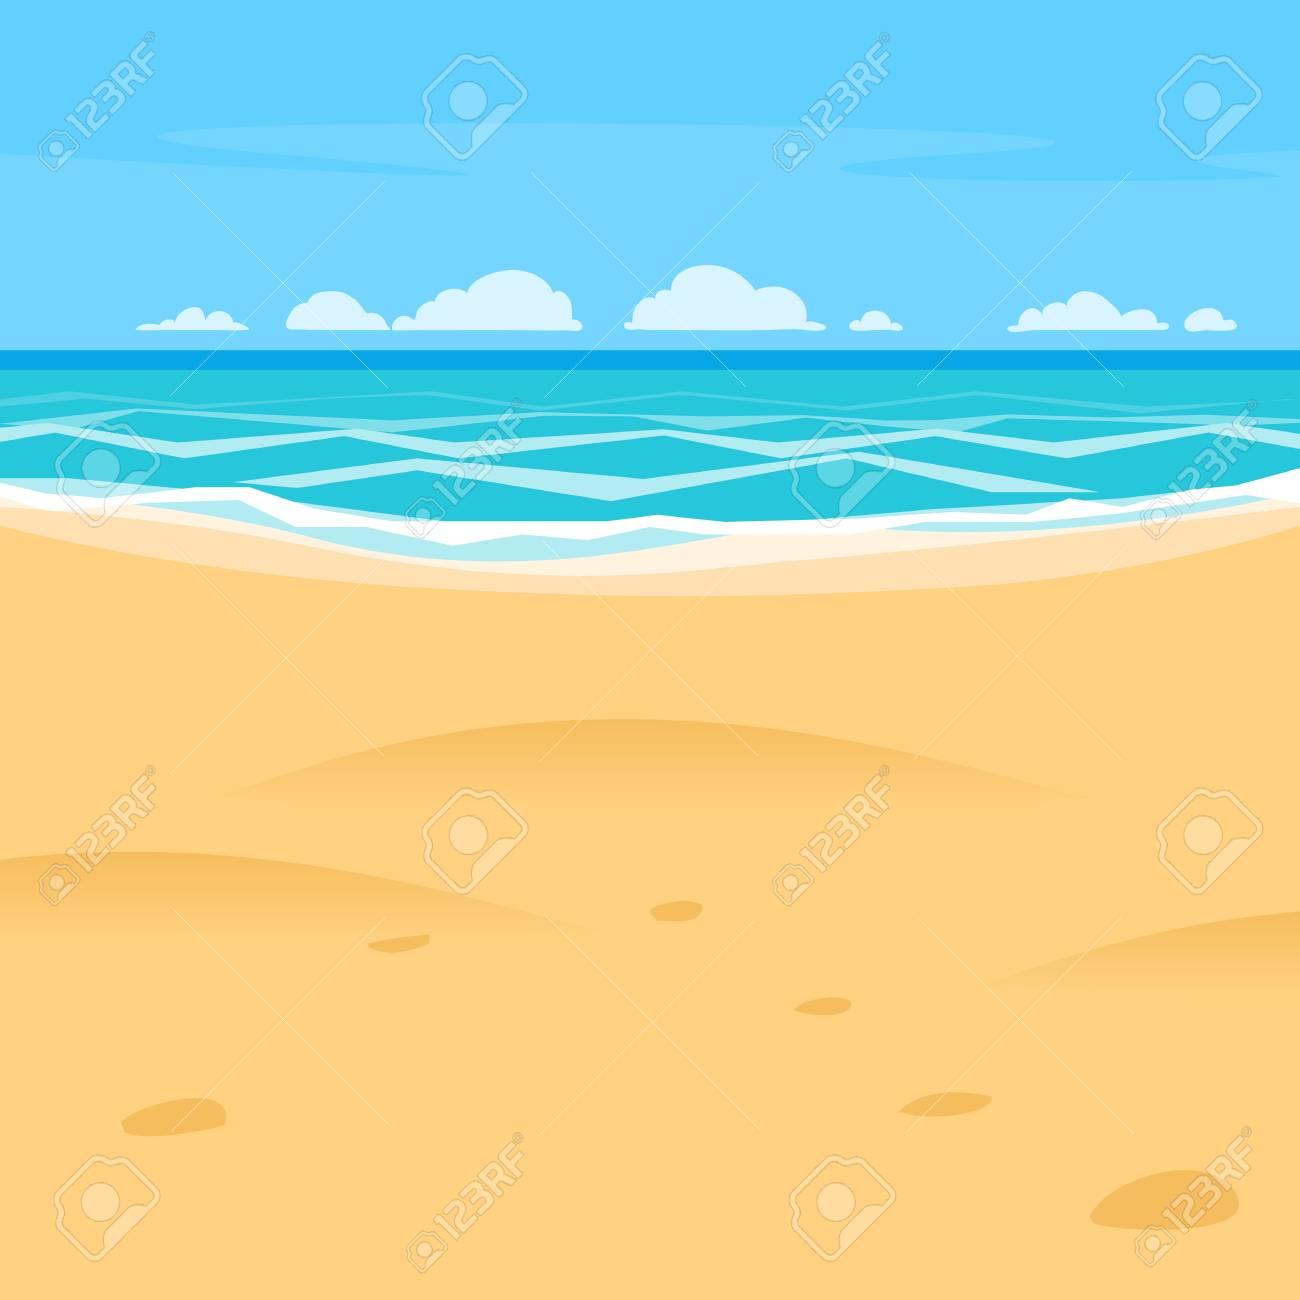 Sea Shore Stock Vector Illustration And Royalty Free Sea Shore Clipart